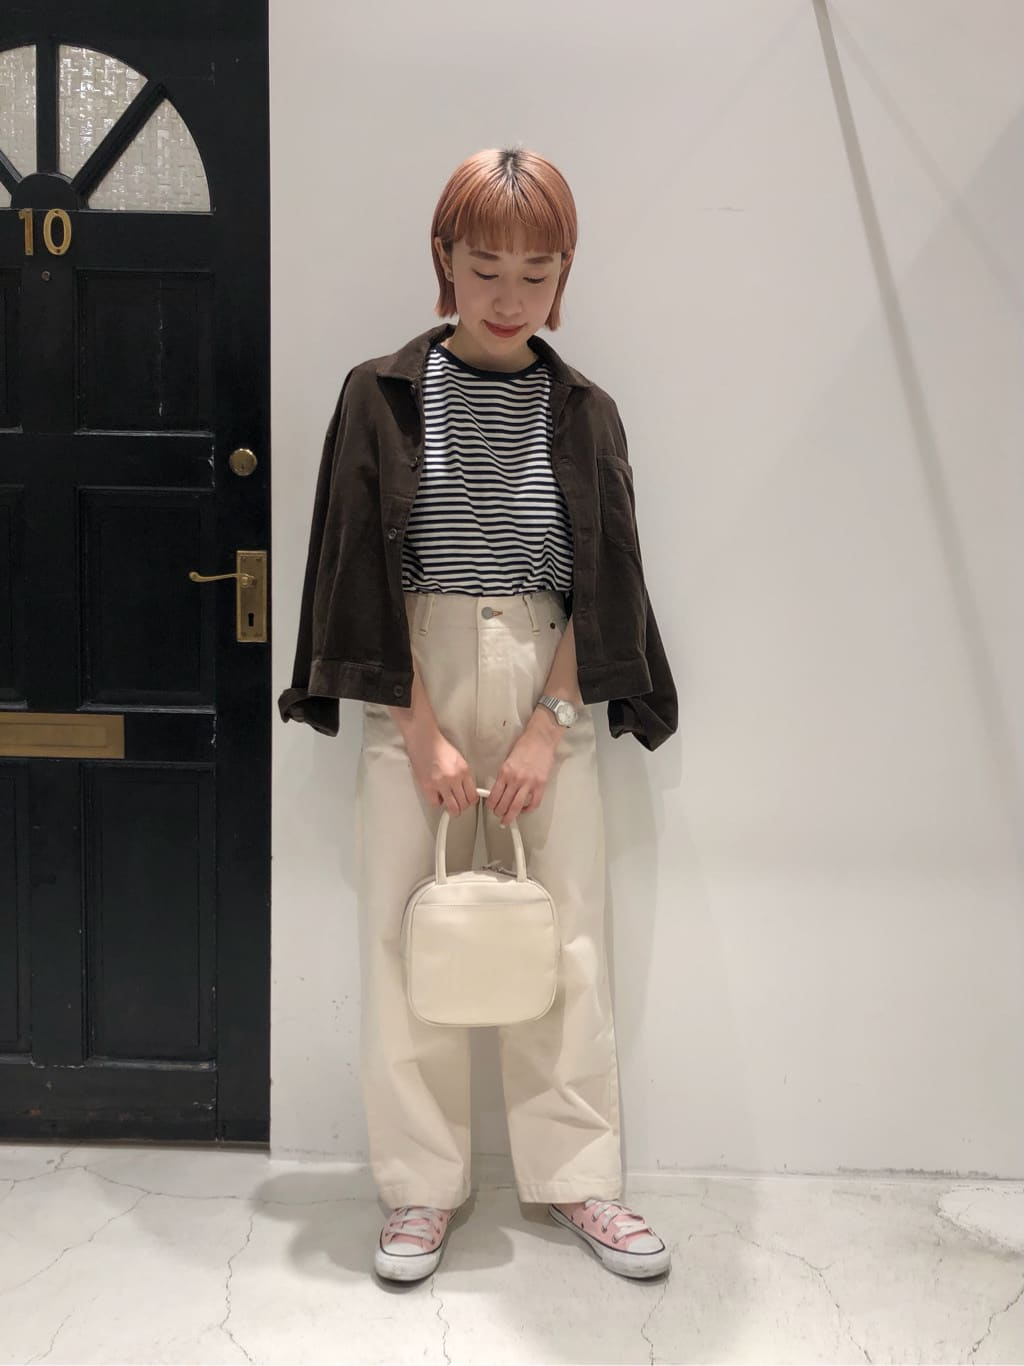 Dot and Stripes CHILD WOMAN ルクアイーレ 身長:157cm 2021.08.31